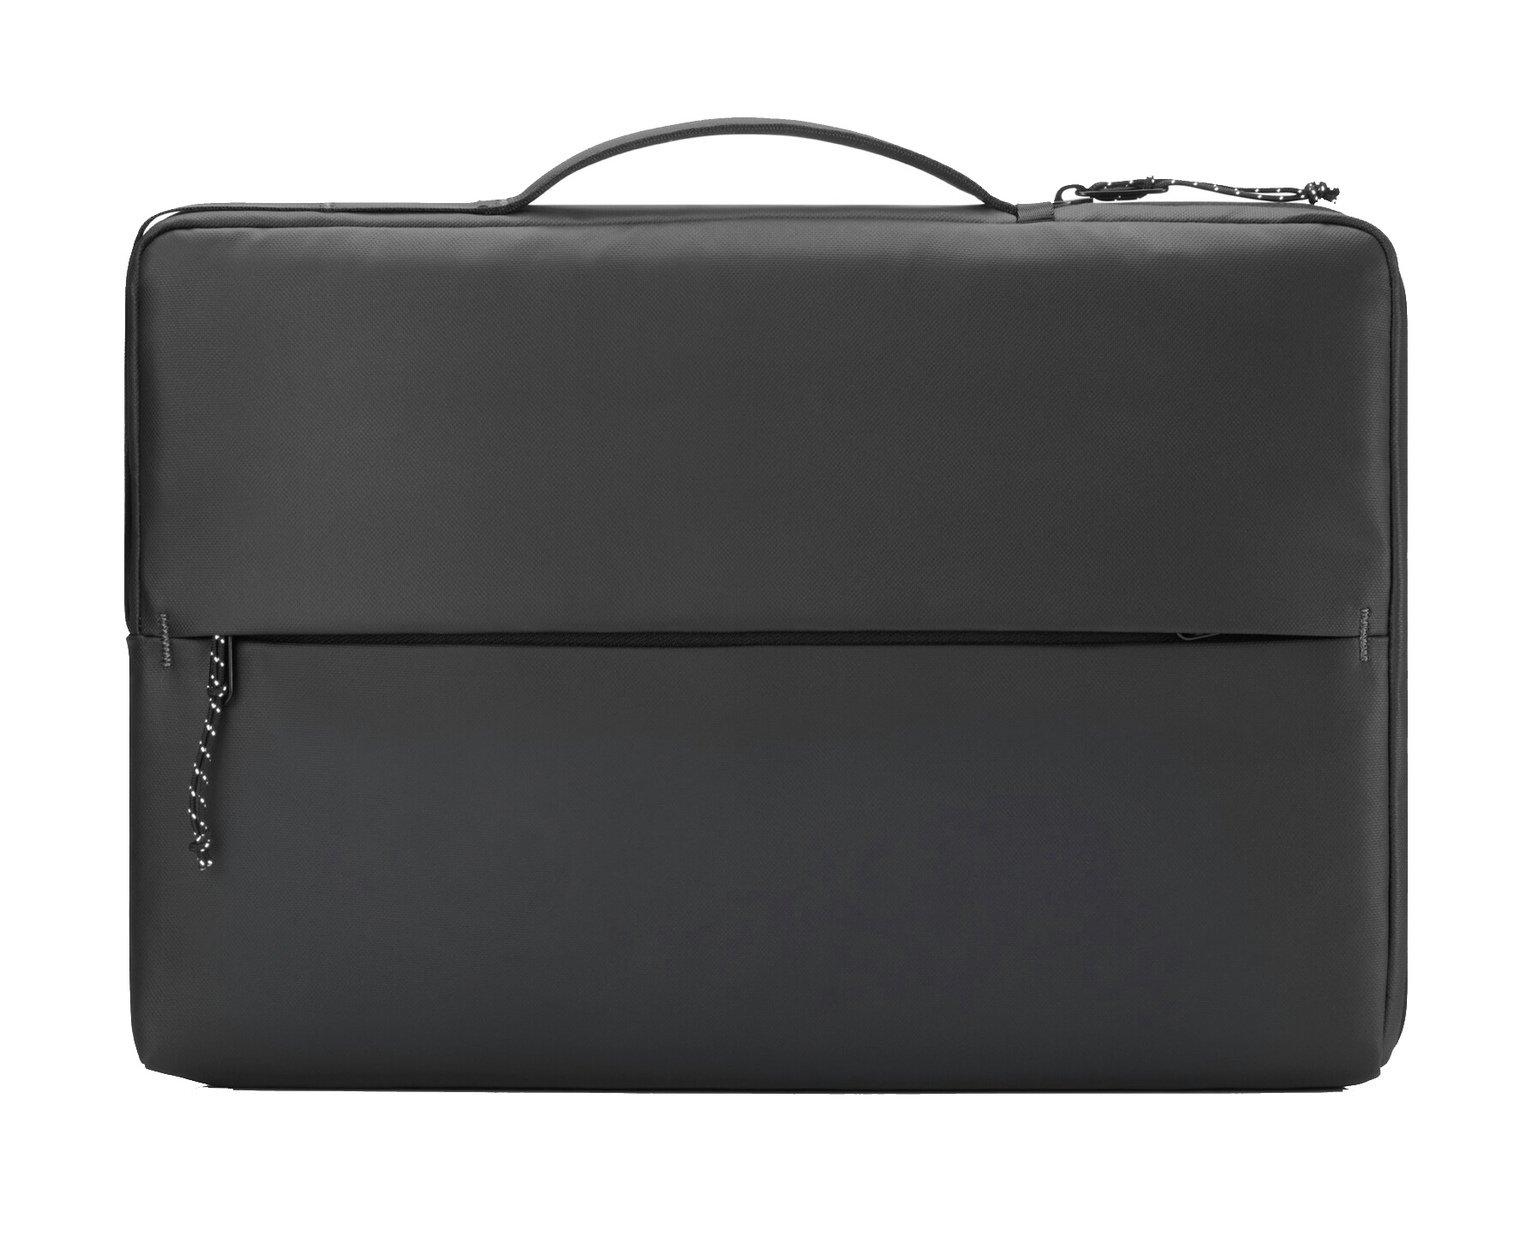 HP 15.6 Inch Laptop Sleeve - Black